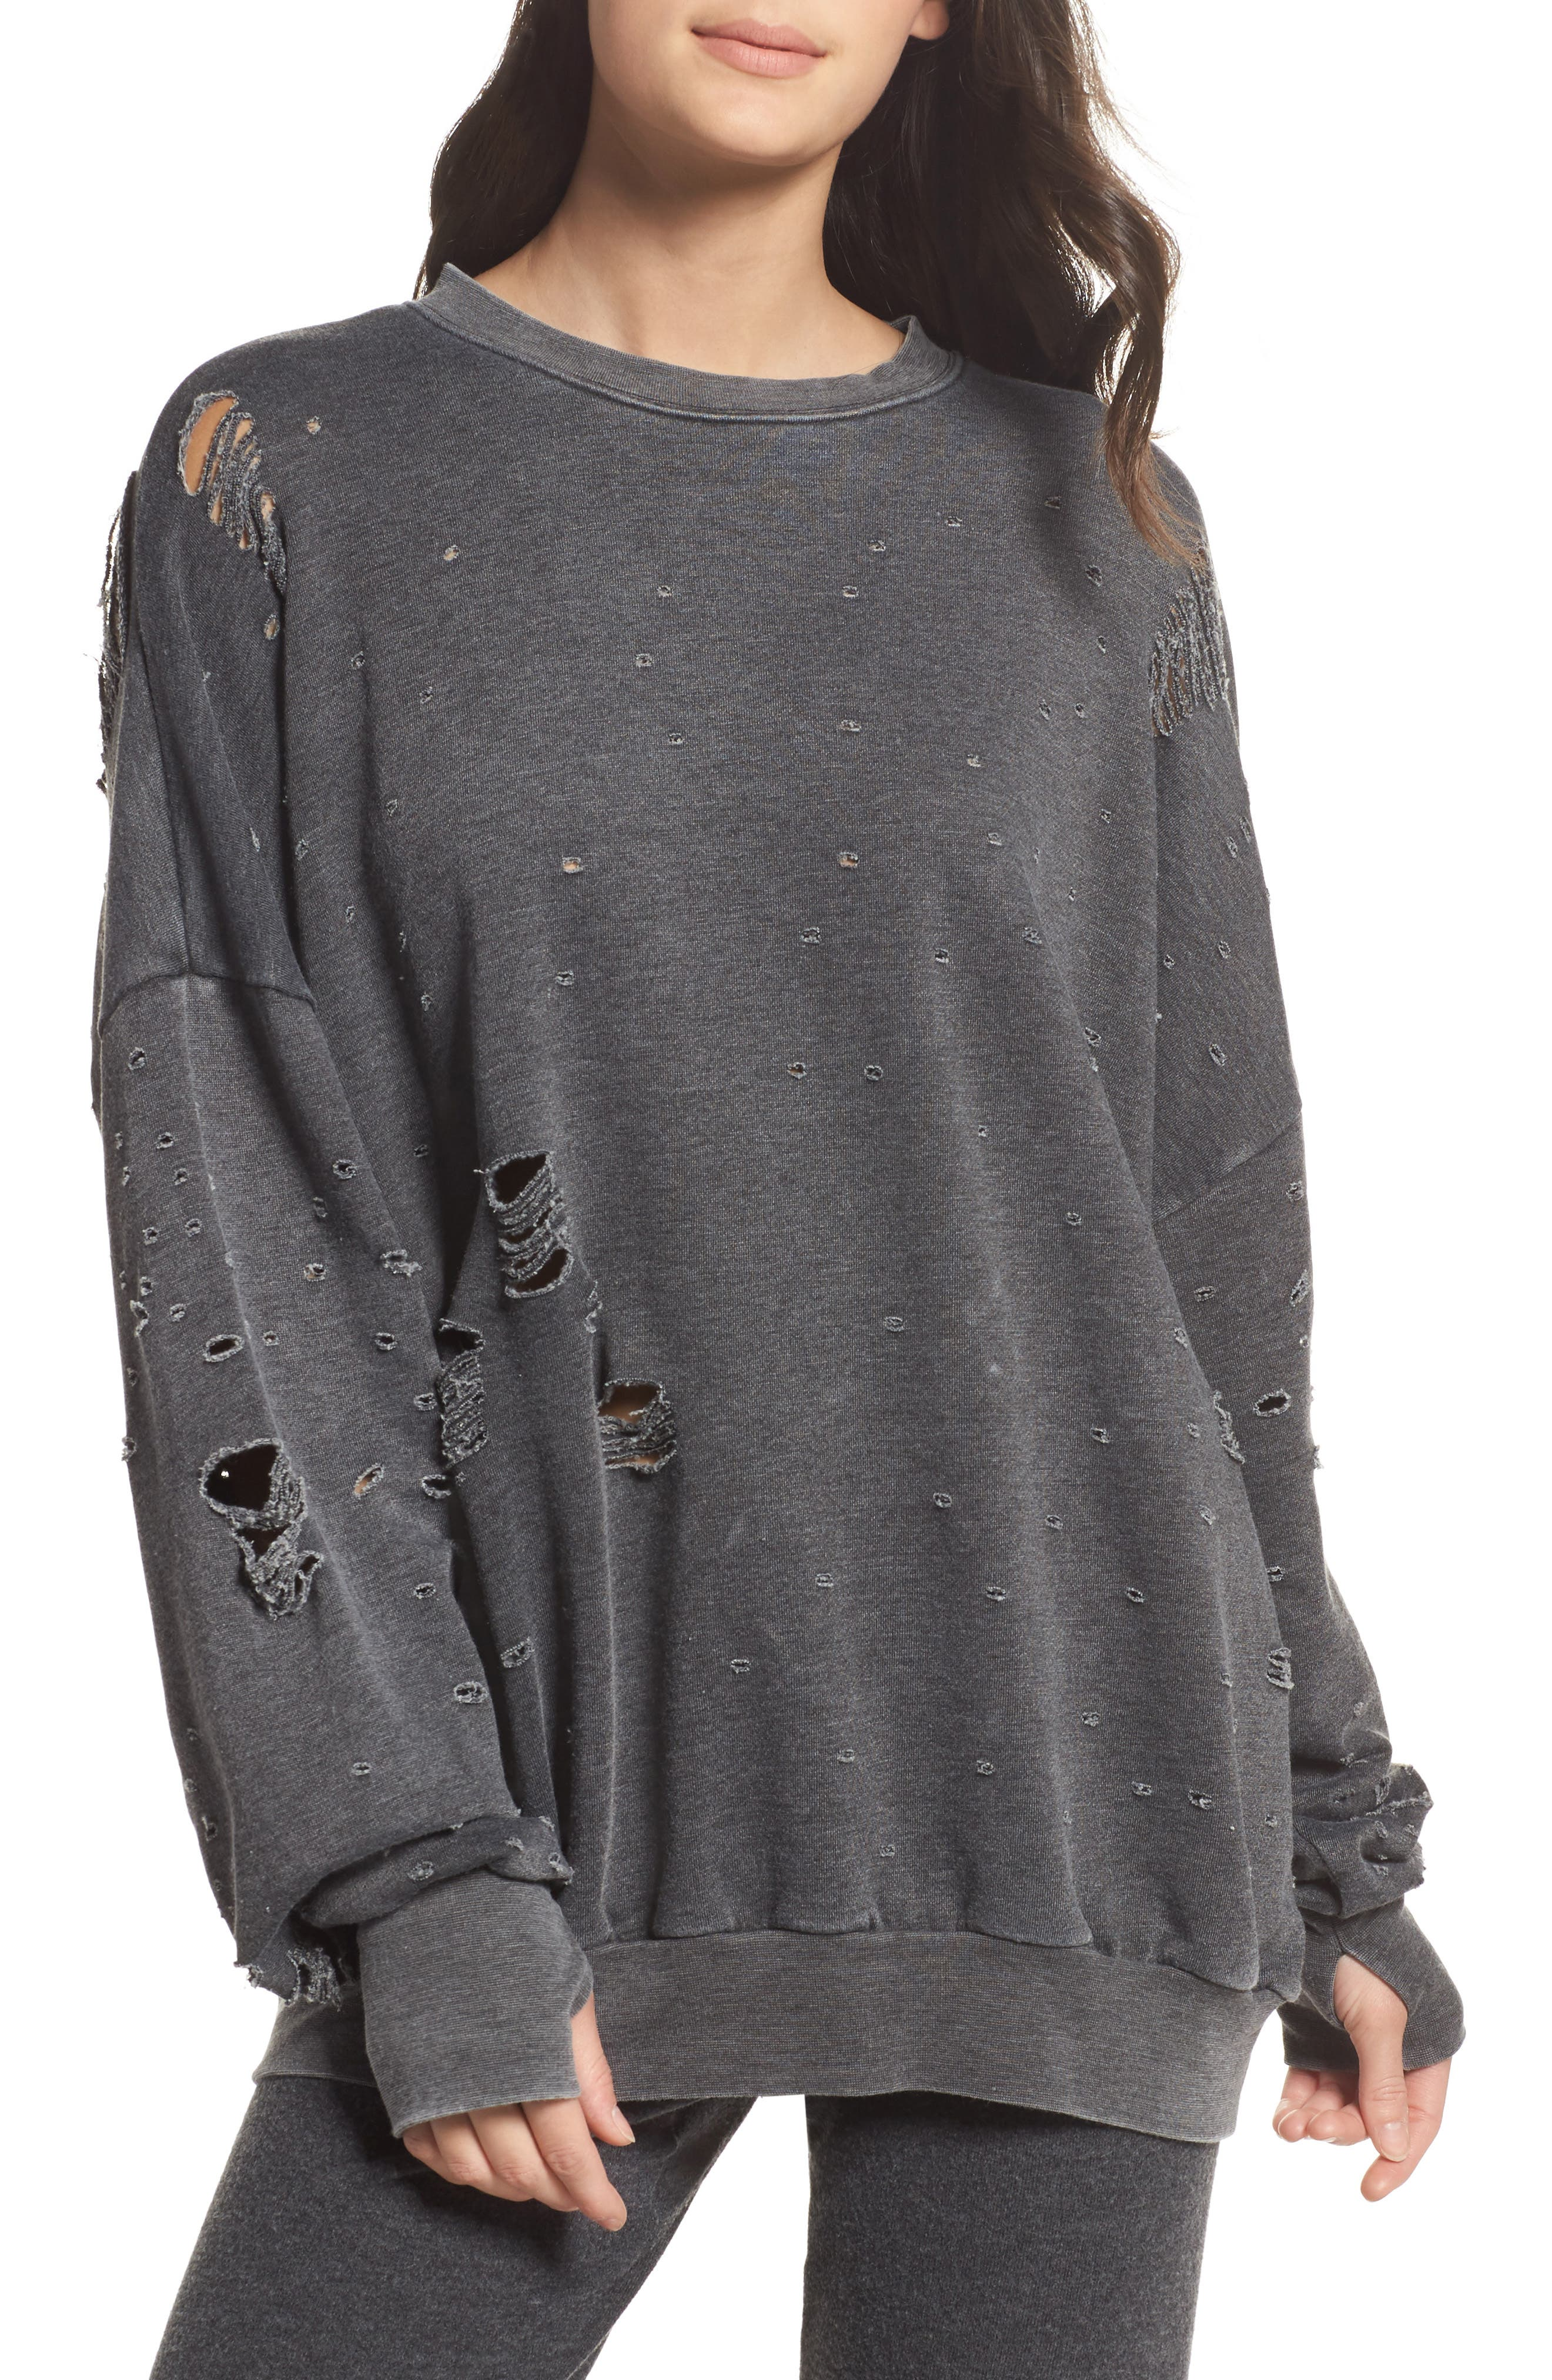 Thrasher Sweatshirt,                             Main thumbnail 1, color,                             020